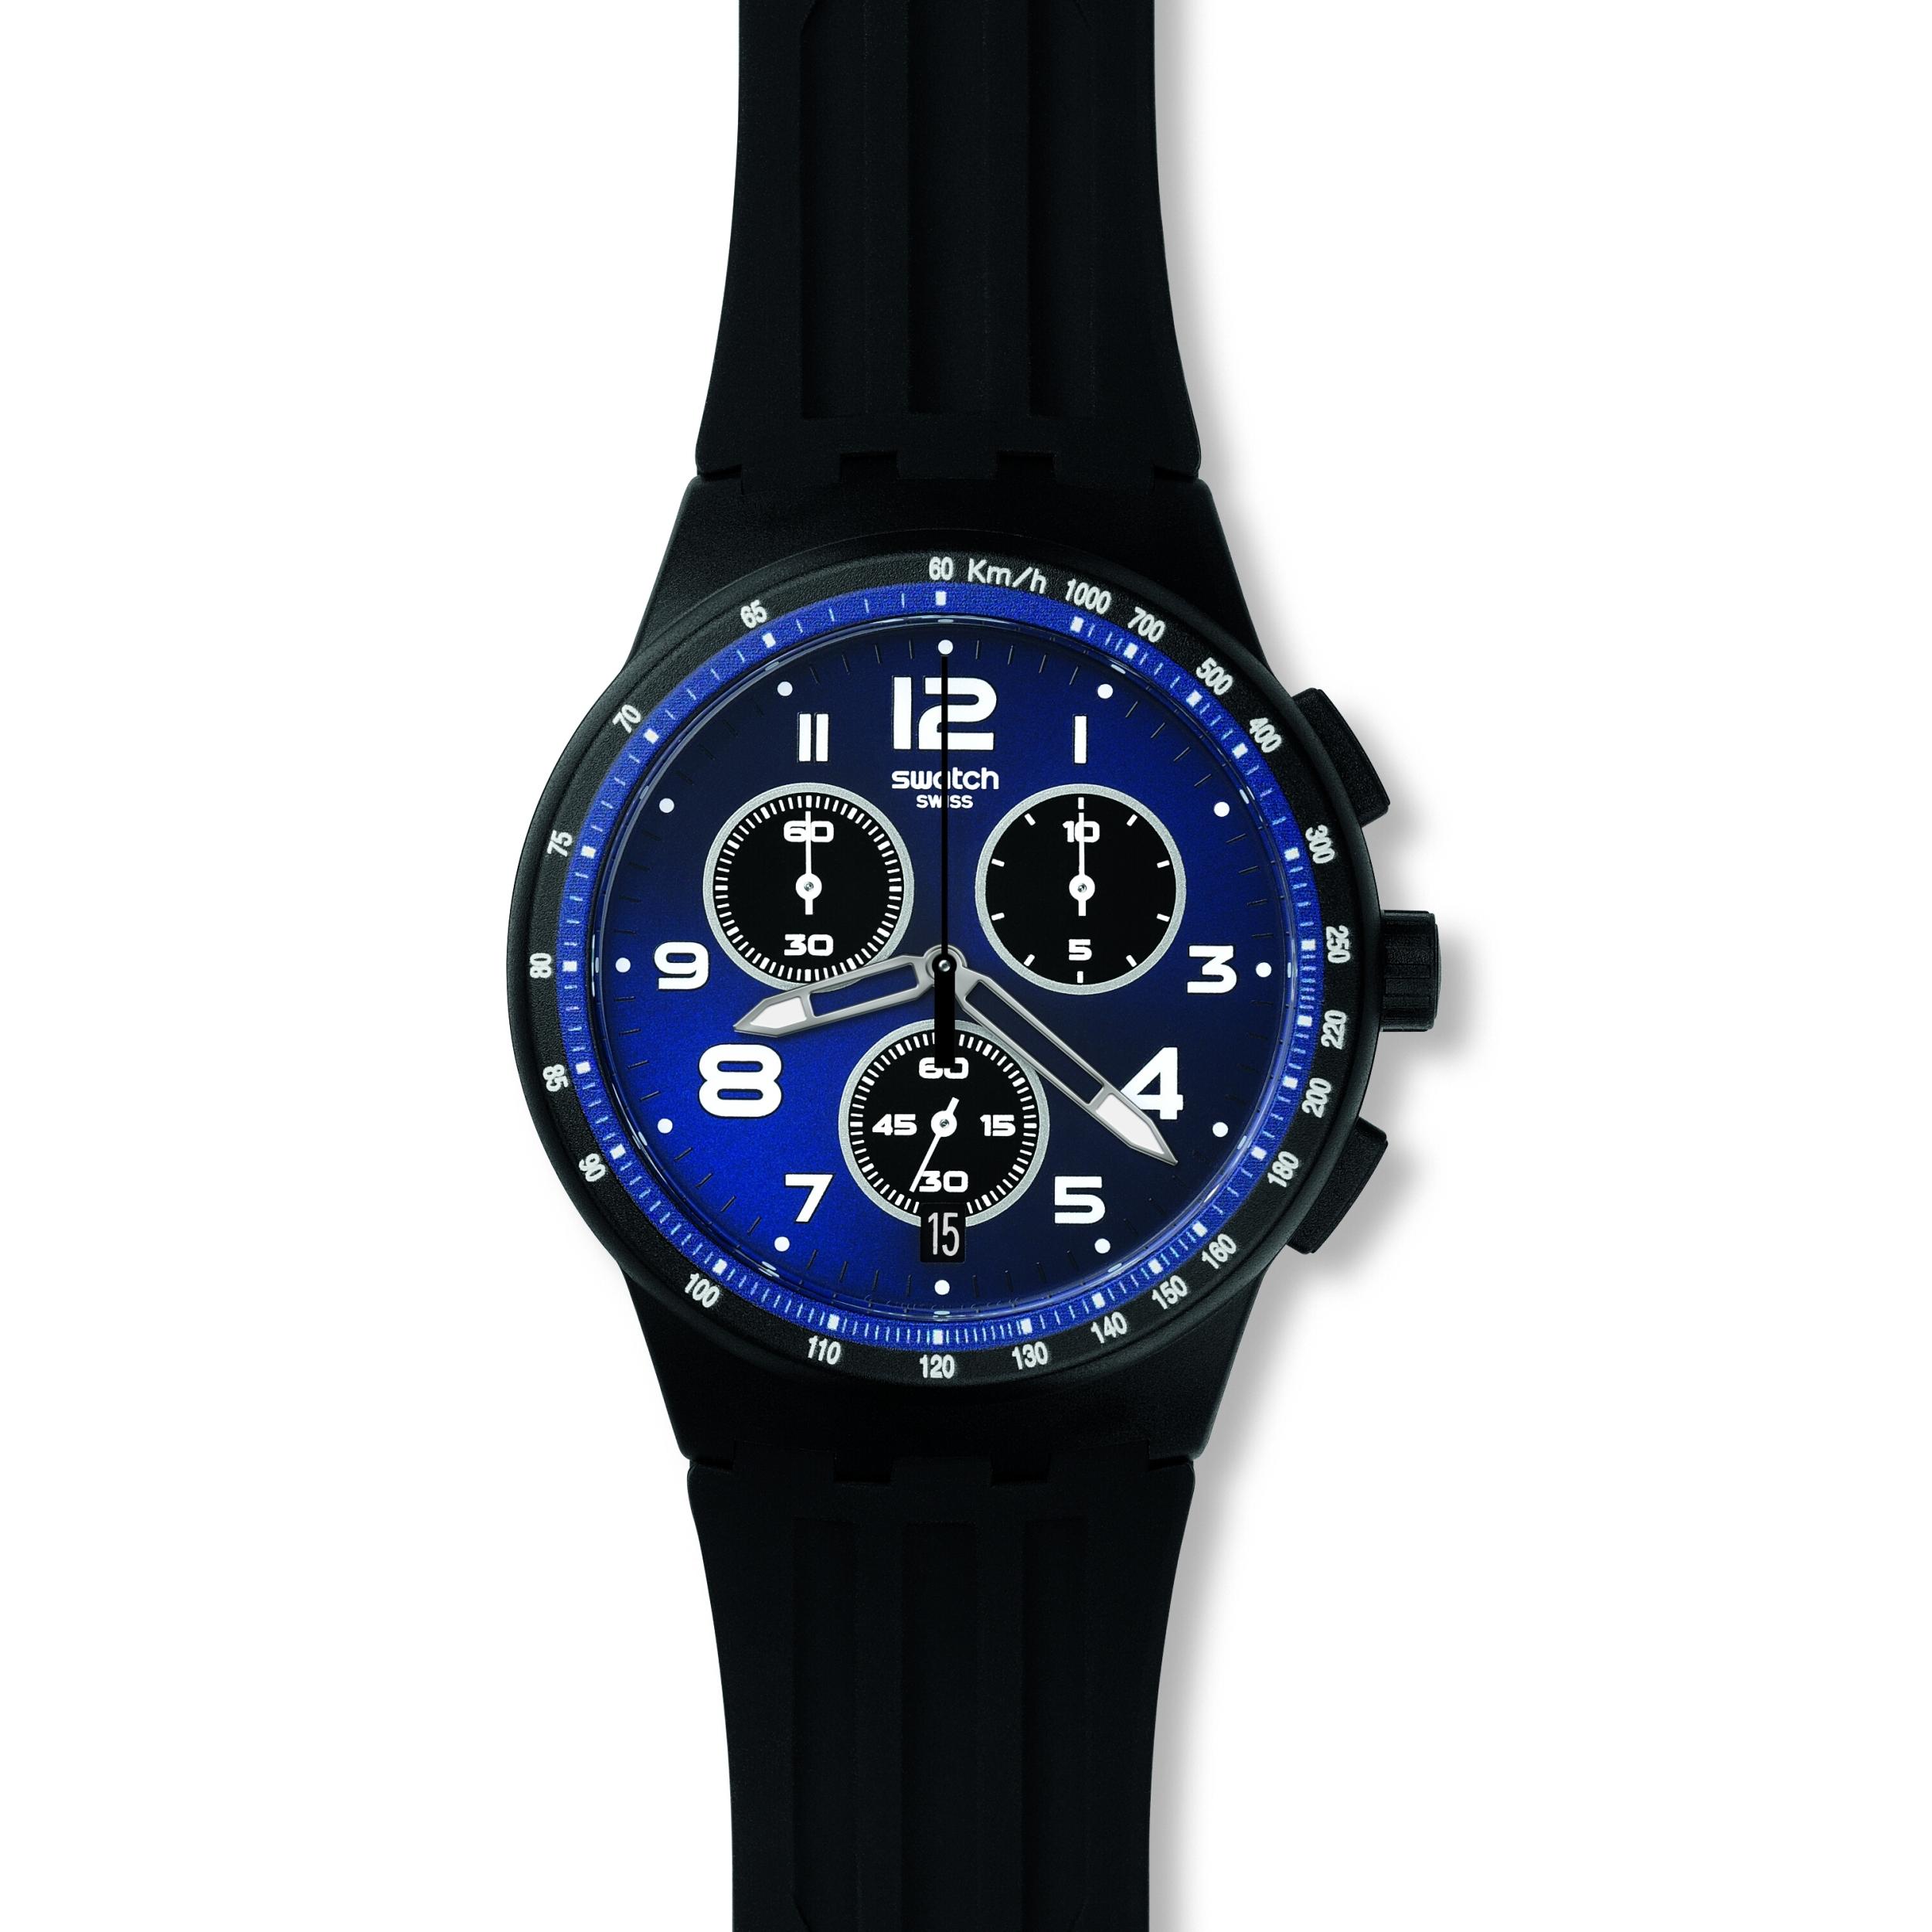 3f2a8d5635 Gents Swatch Nitespeed Chronograph Watch (SUSB402) | WatchShop.com™